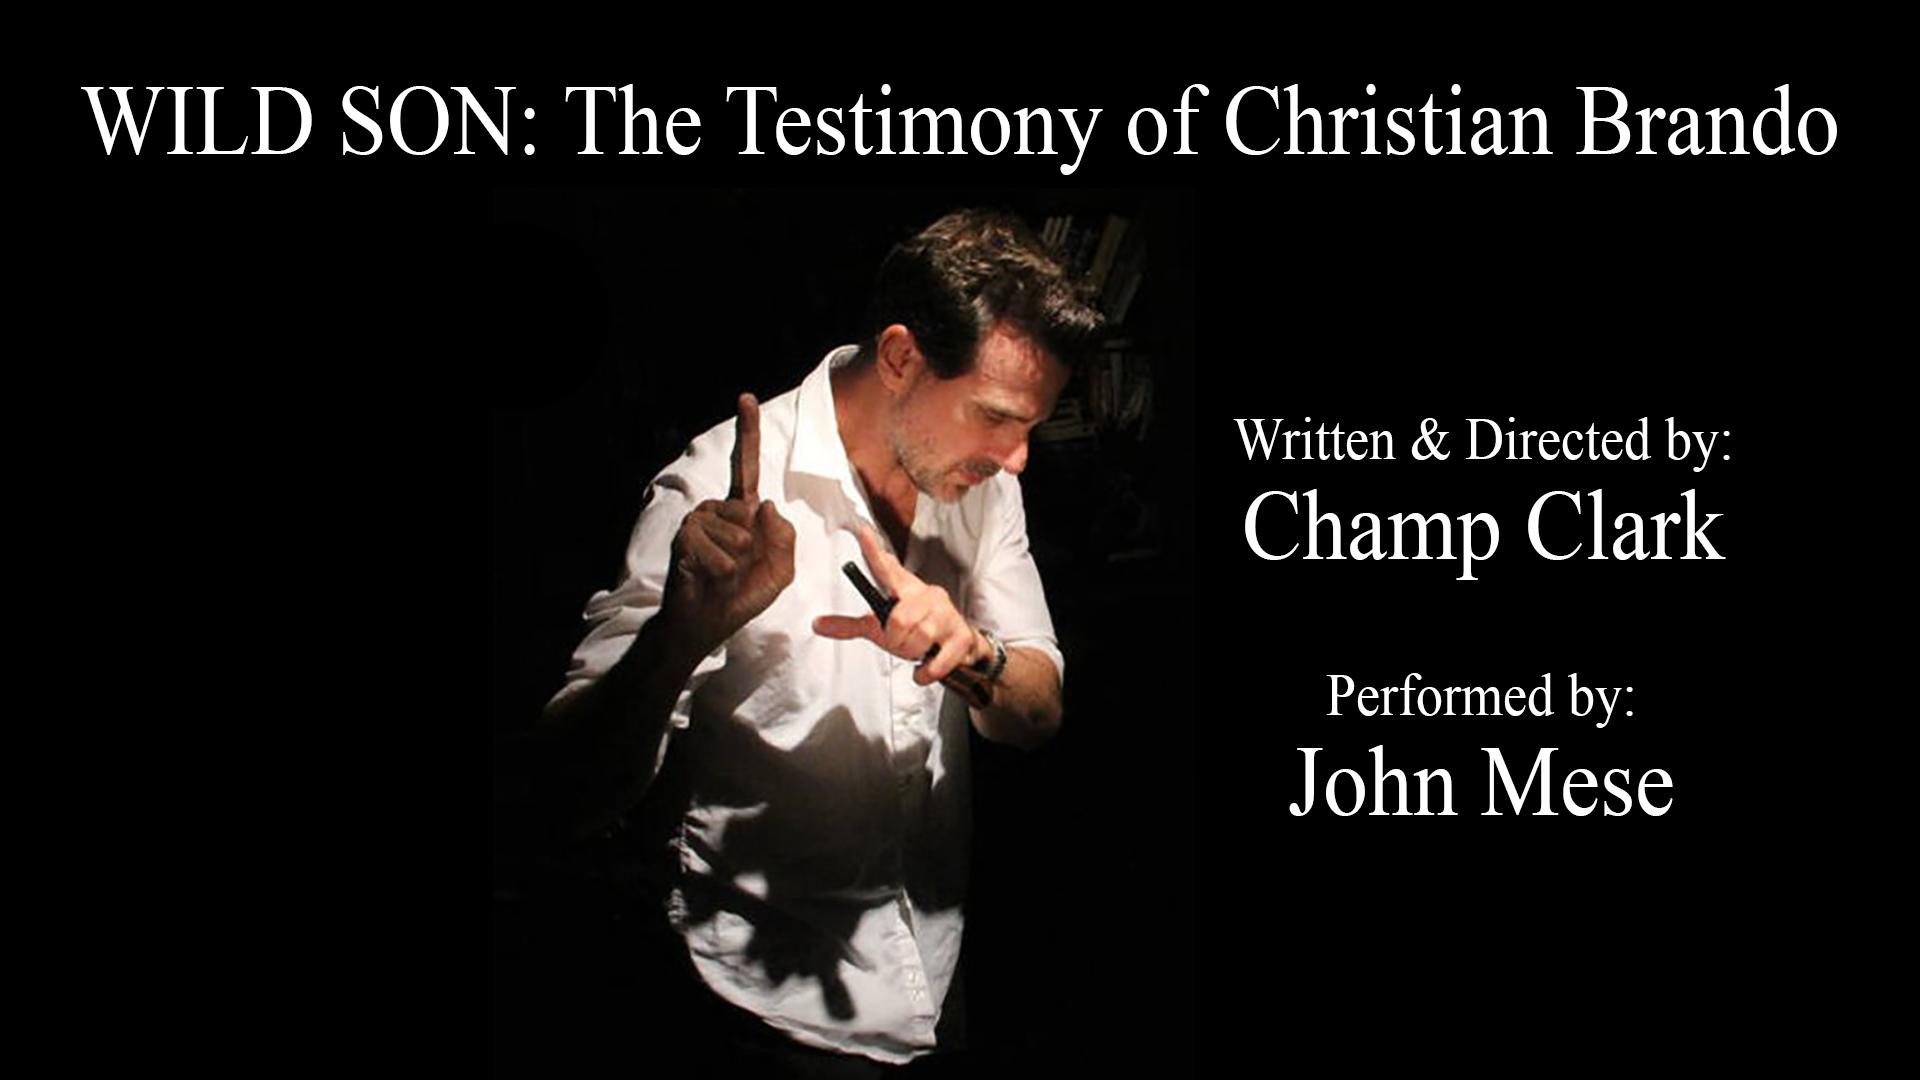 WILD SON: The Testimony of Christian Brandon Feb 13  @ 7pm PST